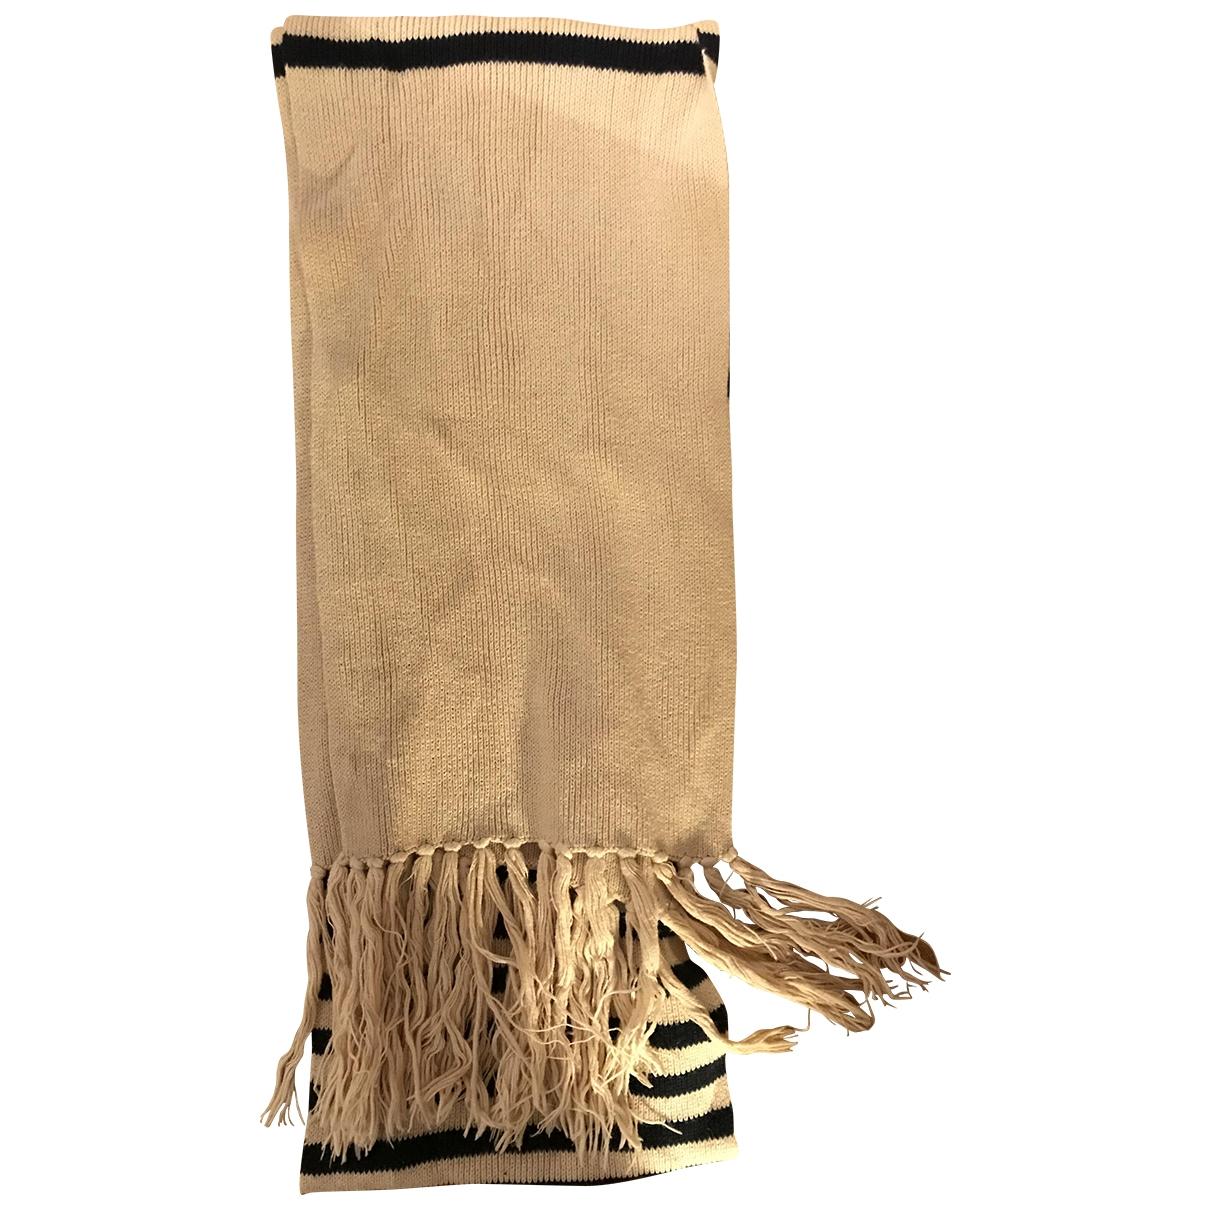 Apc - Foulard   pour femme en coton - ecru